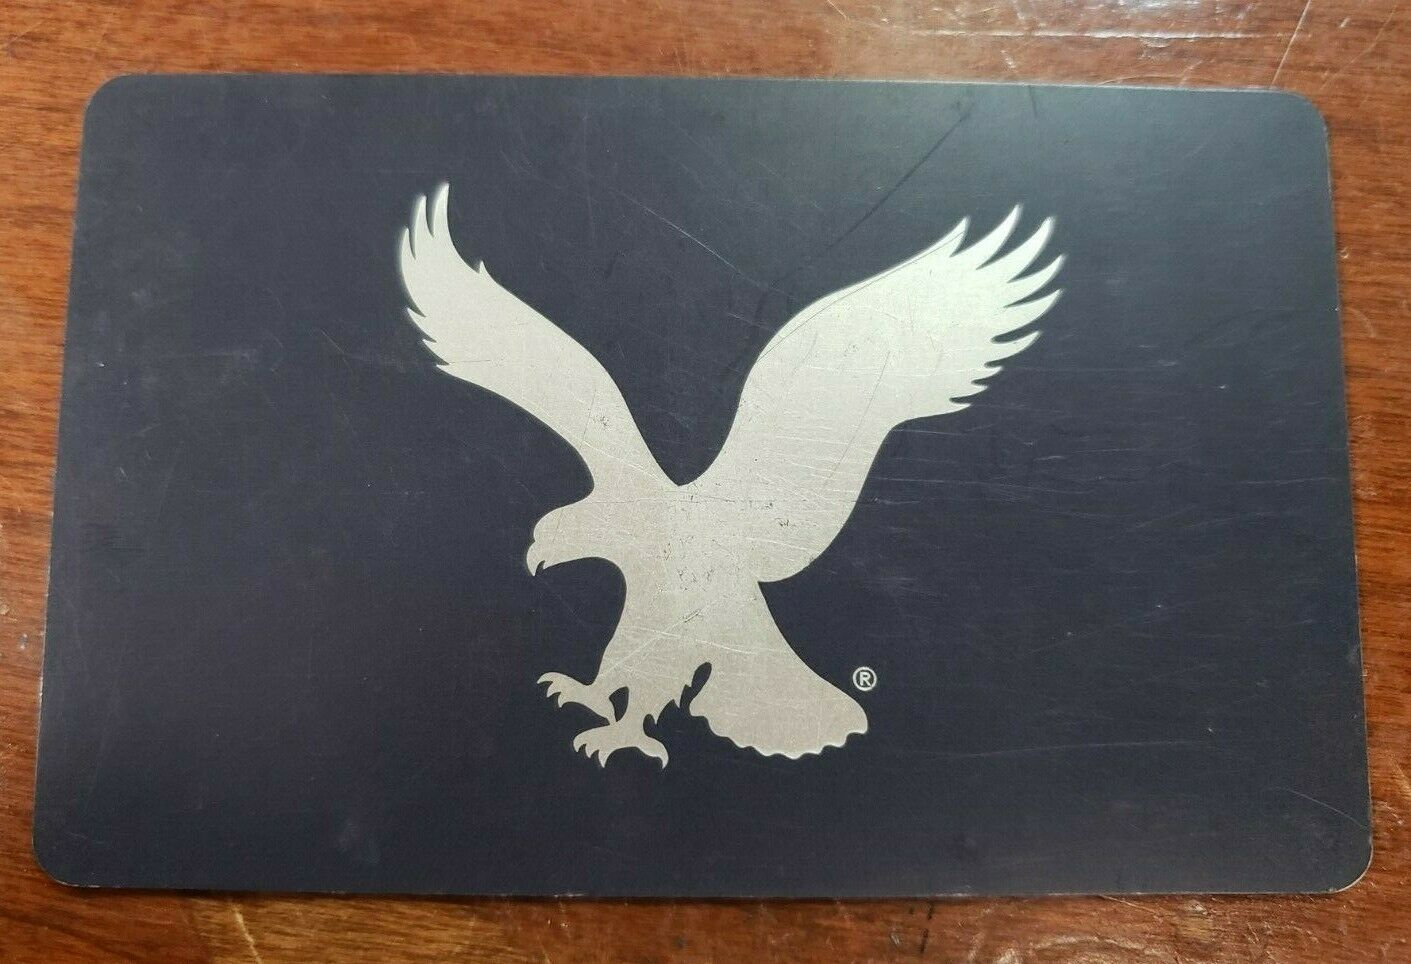 500 American Eagle Gift Card - $400.00